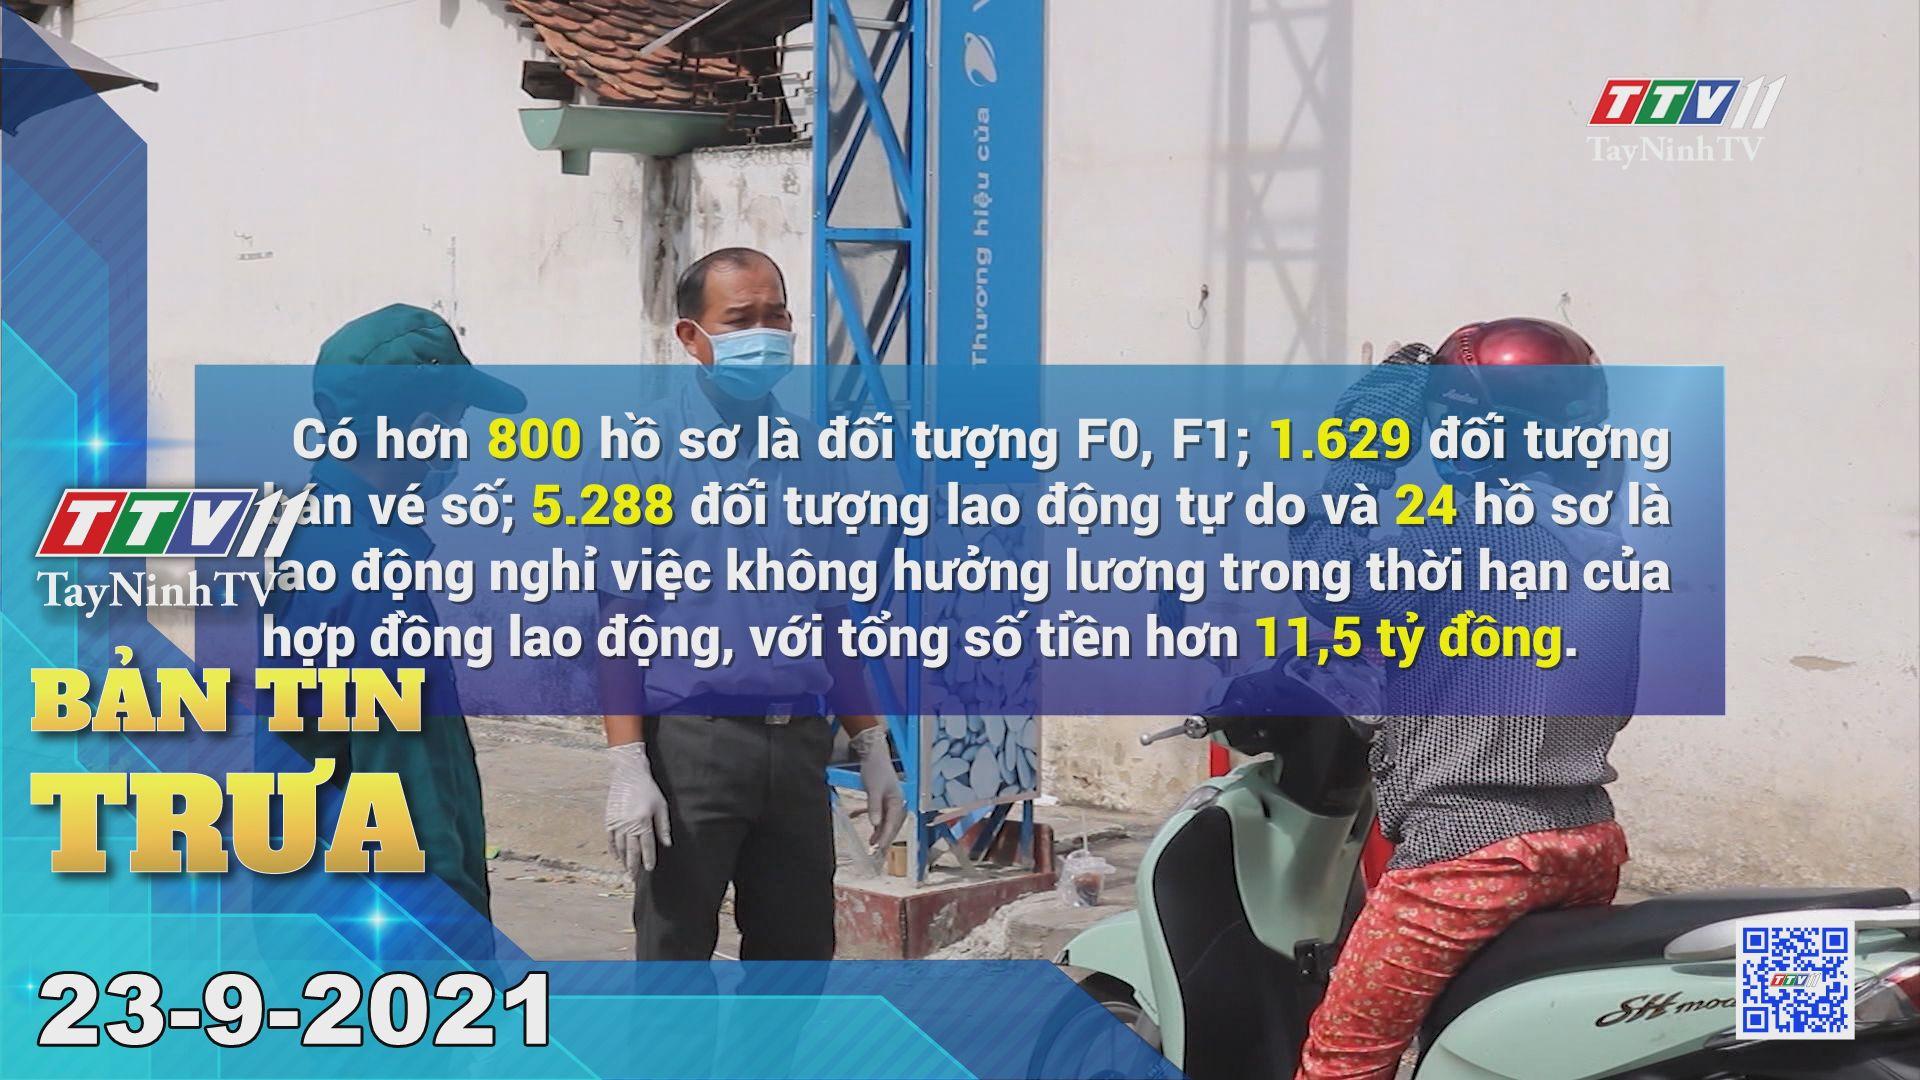 Bản tin trưa 23/9/2021 | Tin tức hôm nay | TayNinhTV